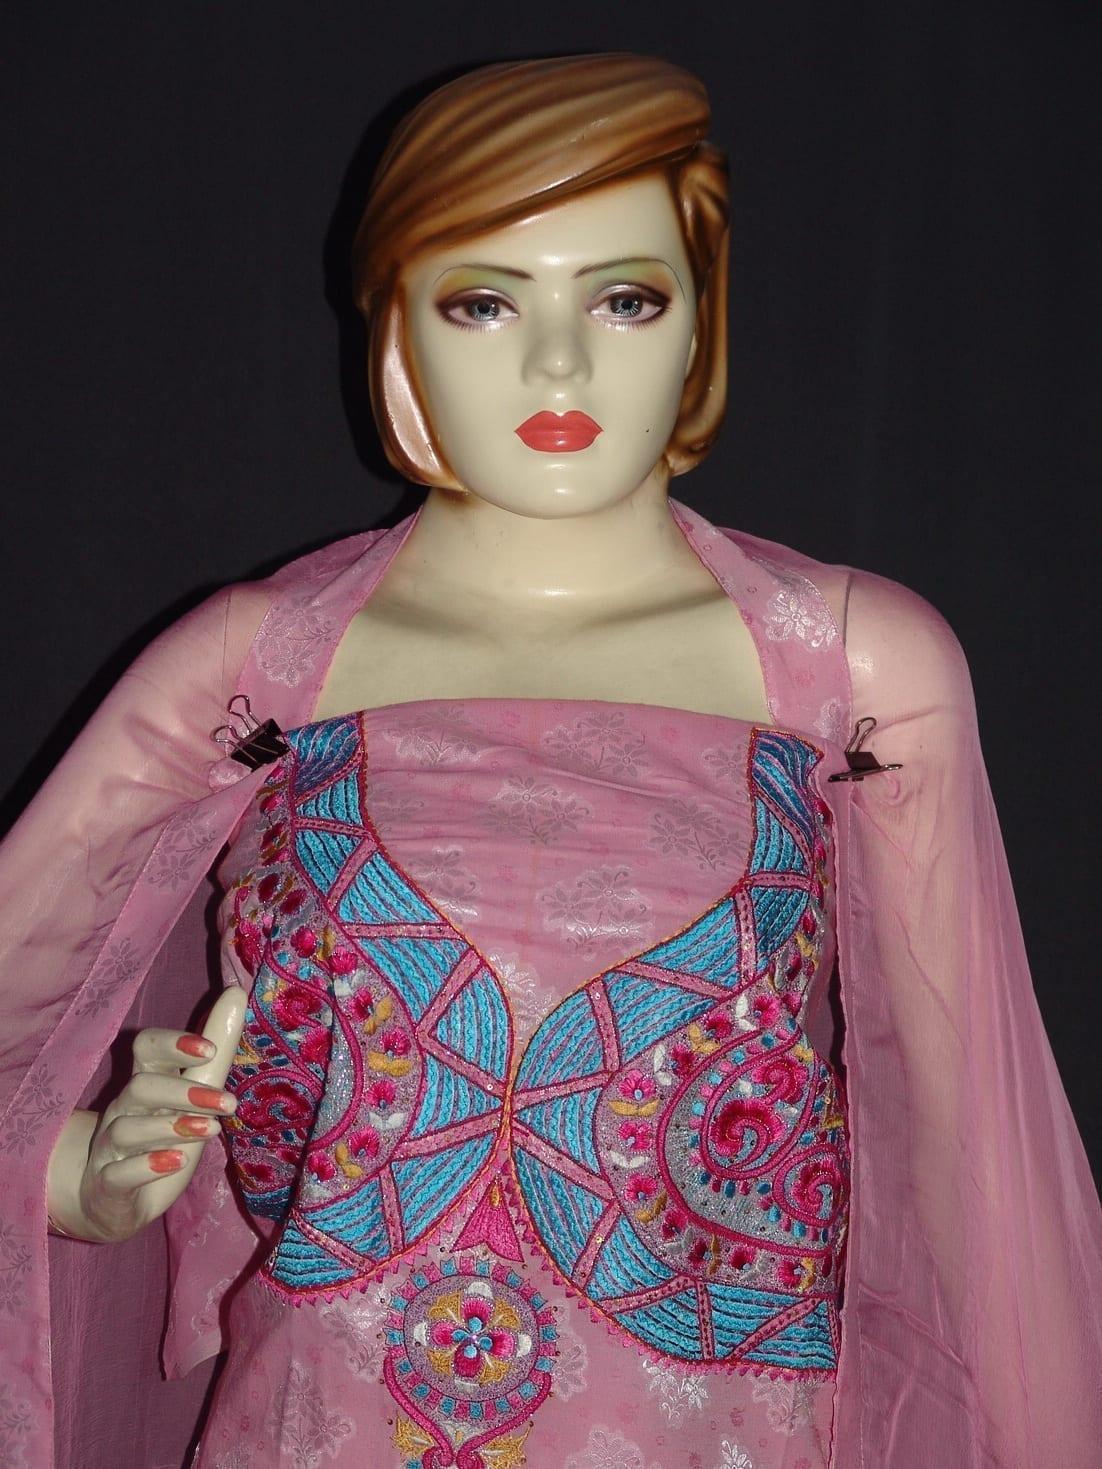 Self Print Cotton Embroidered Salwar Kameez Dupatta Suit RM128 3